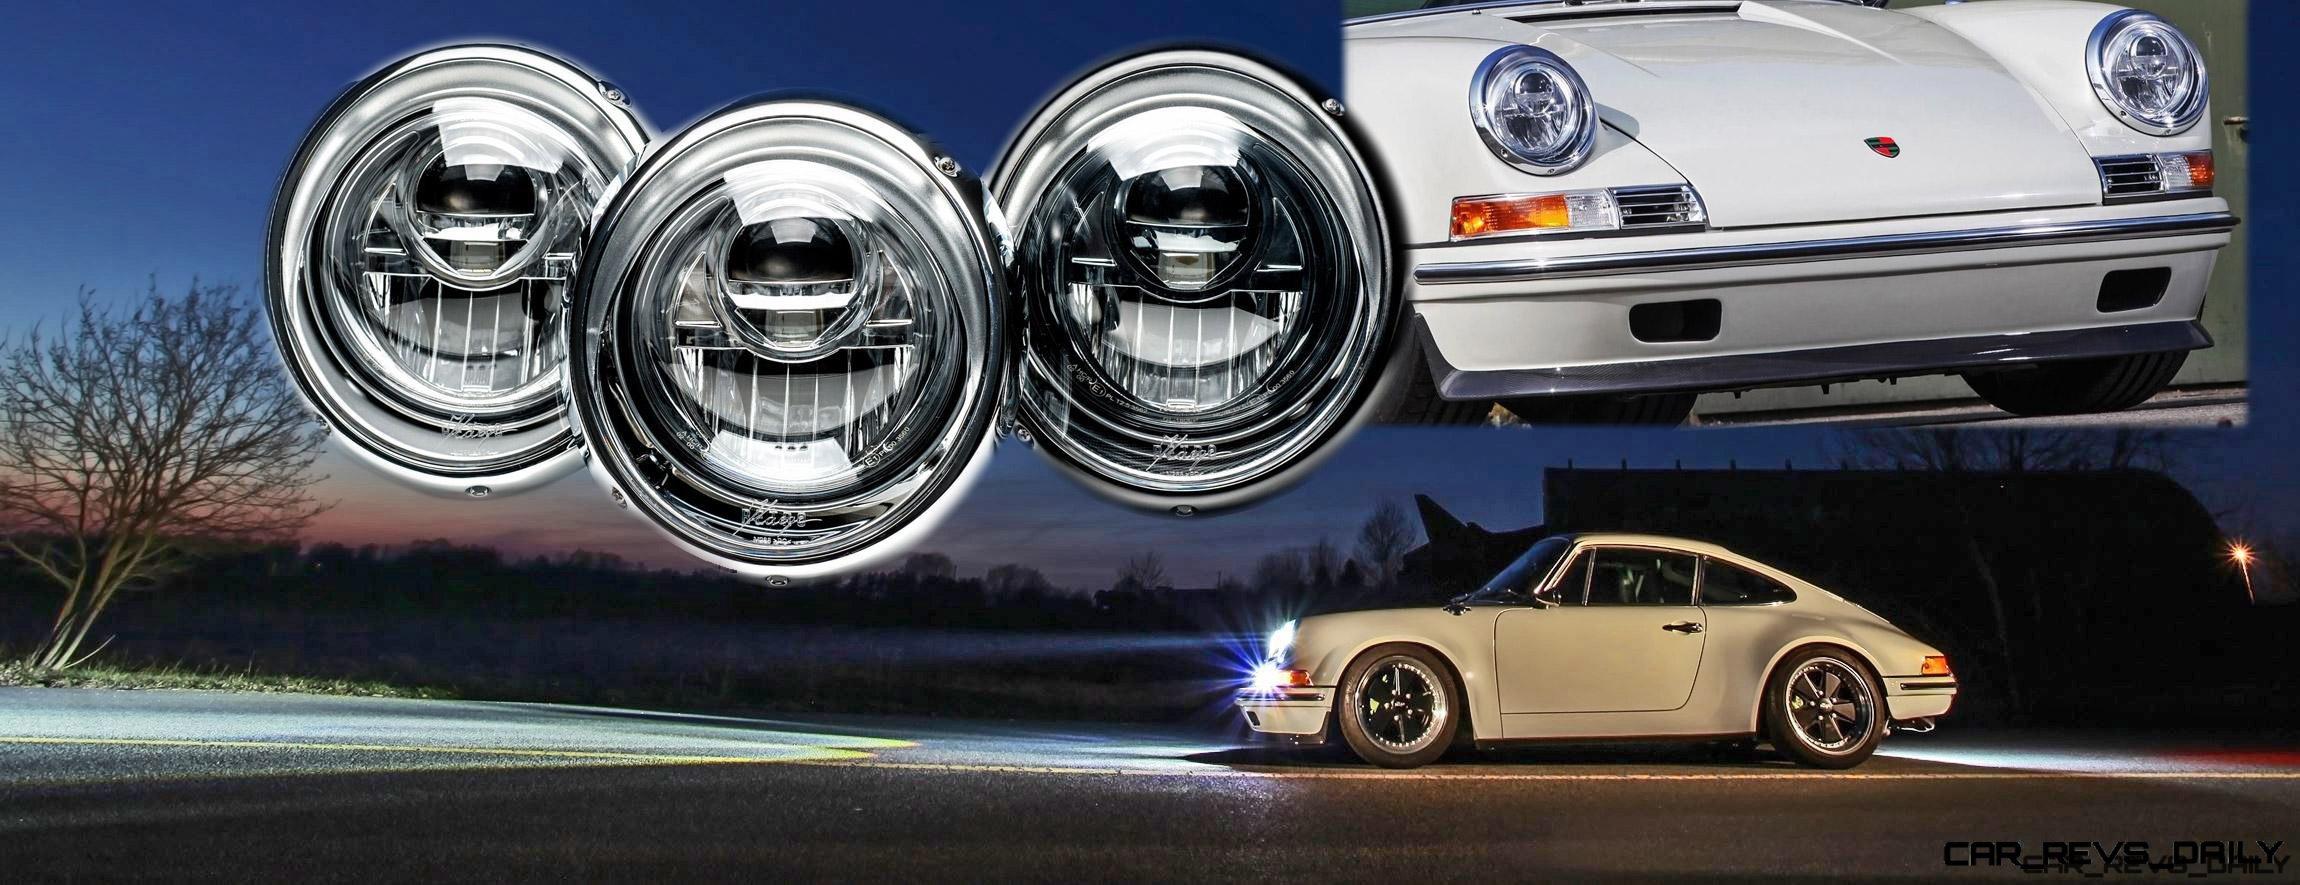 Kaege De Reveals Led Projector Headlamps For Classic 911s